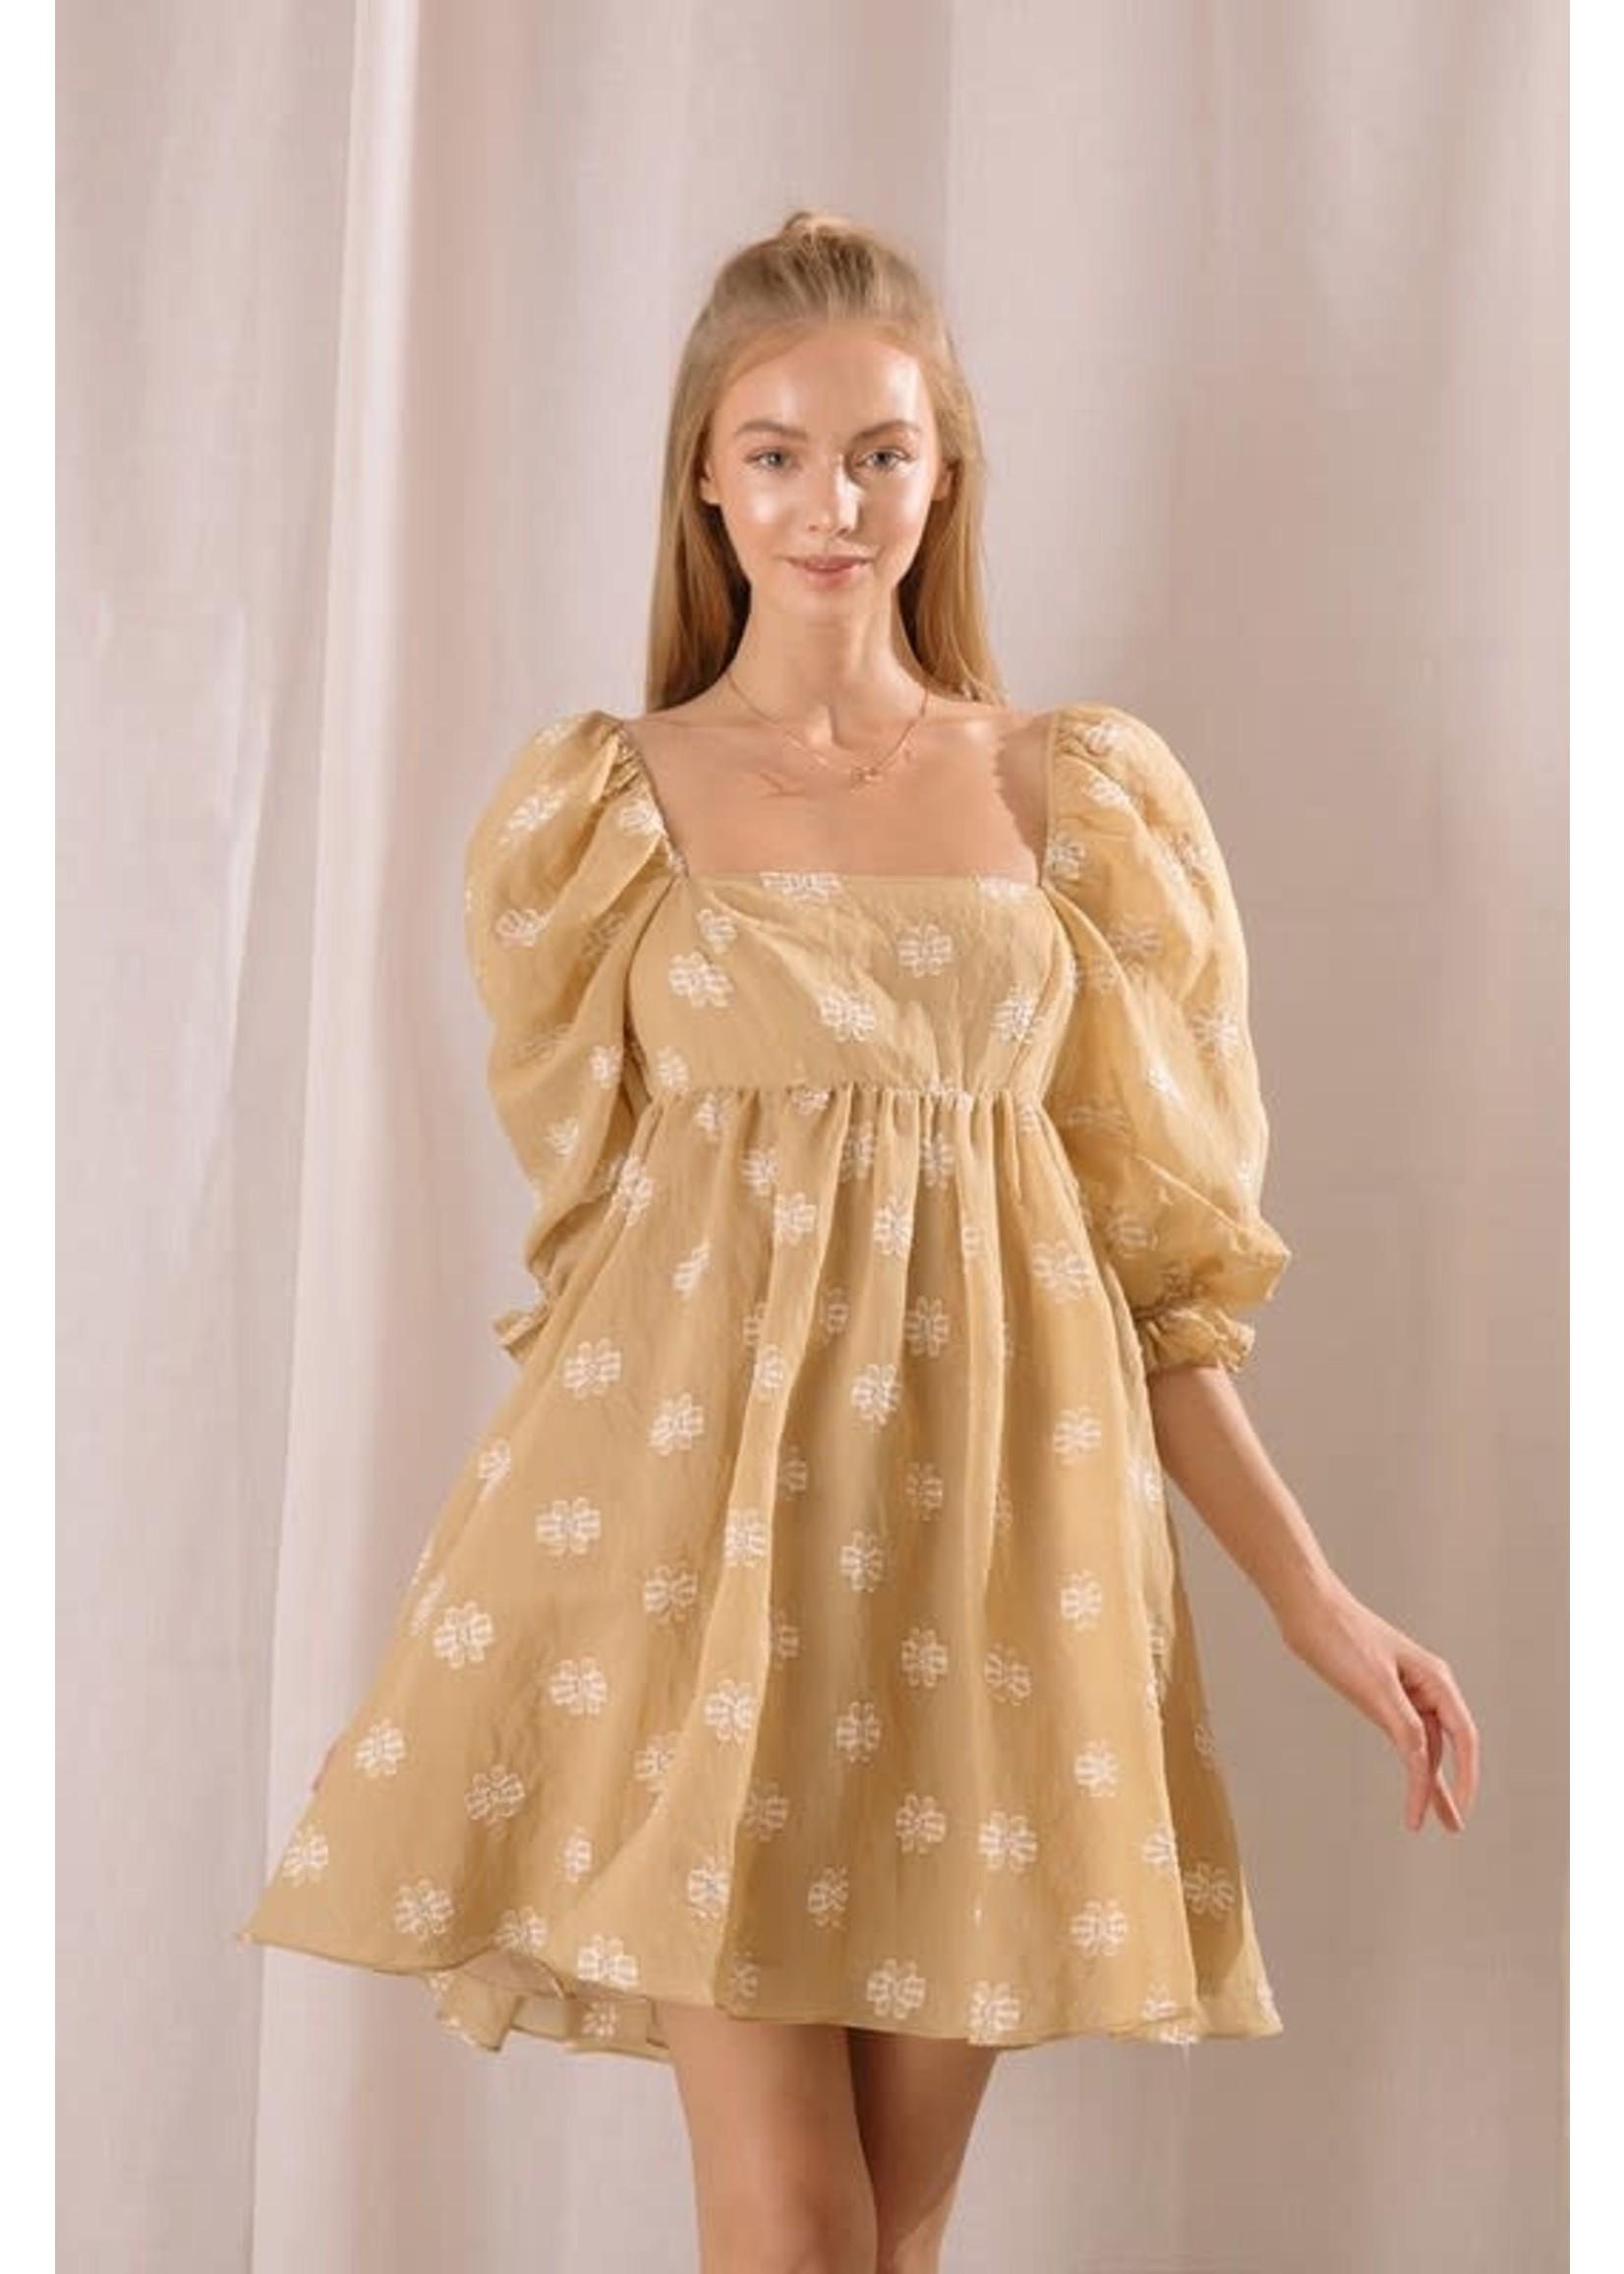 Storia Daisy Applique Babydoll Mini Dress - JD2443DS